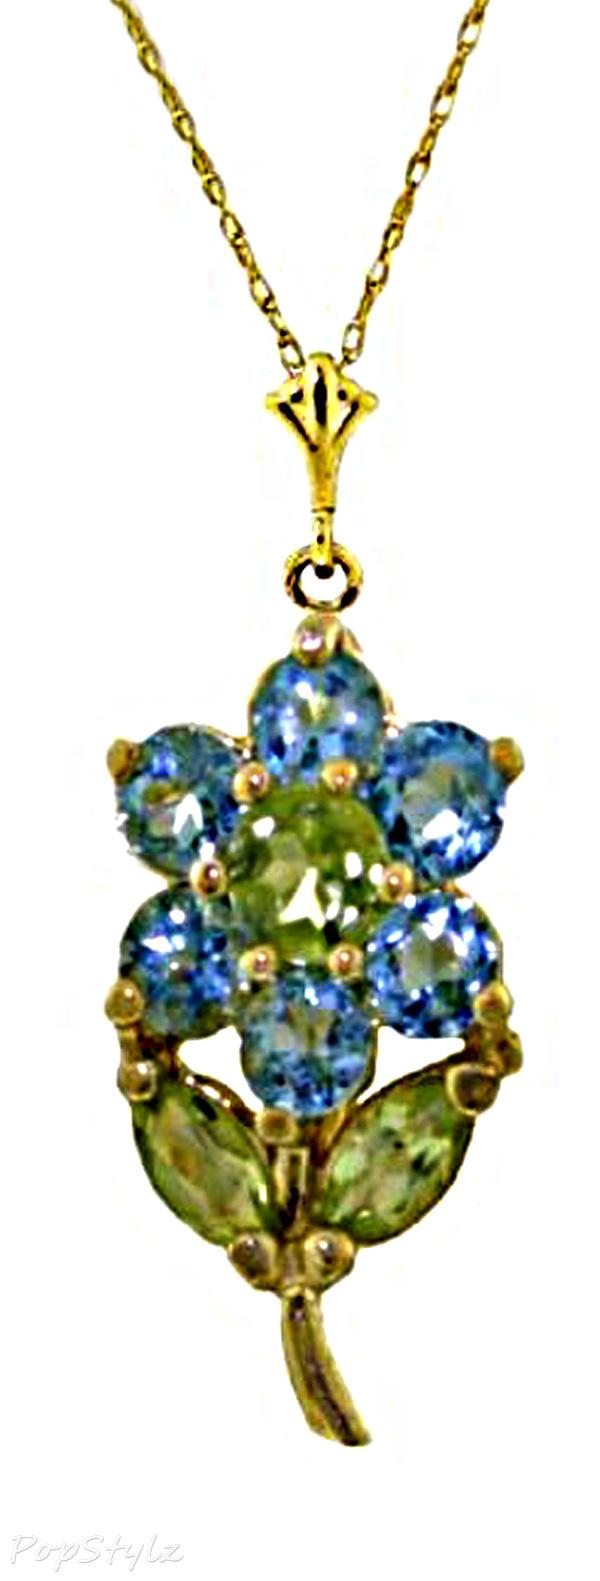 14k Gold Genuine Topaz & Peridots Flower Necklace